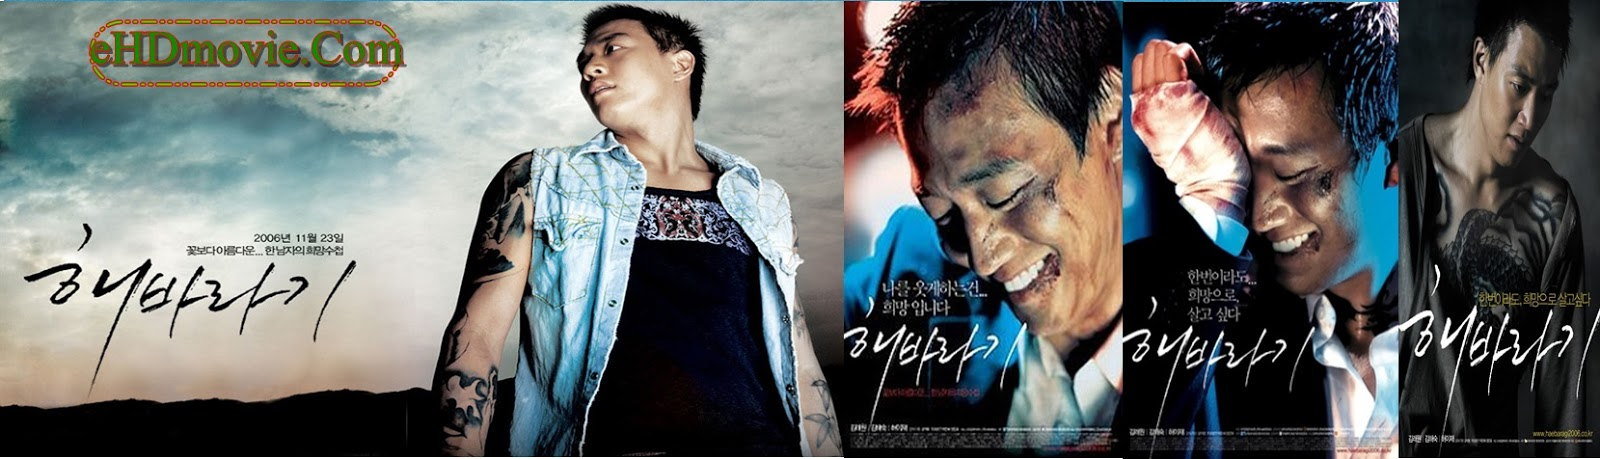 Sunflower 2006 Full Movie Korean 720p - 480p ORG BRRip 450MB - 950MB ESubs Free Download